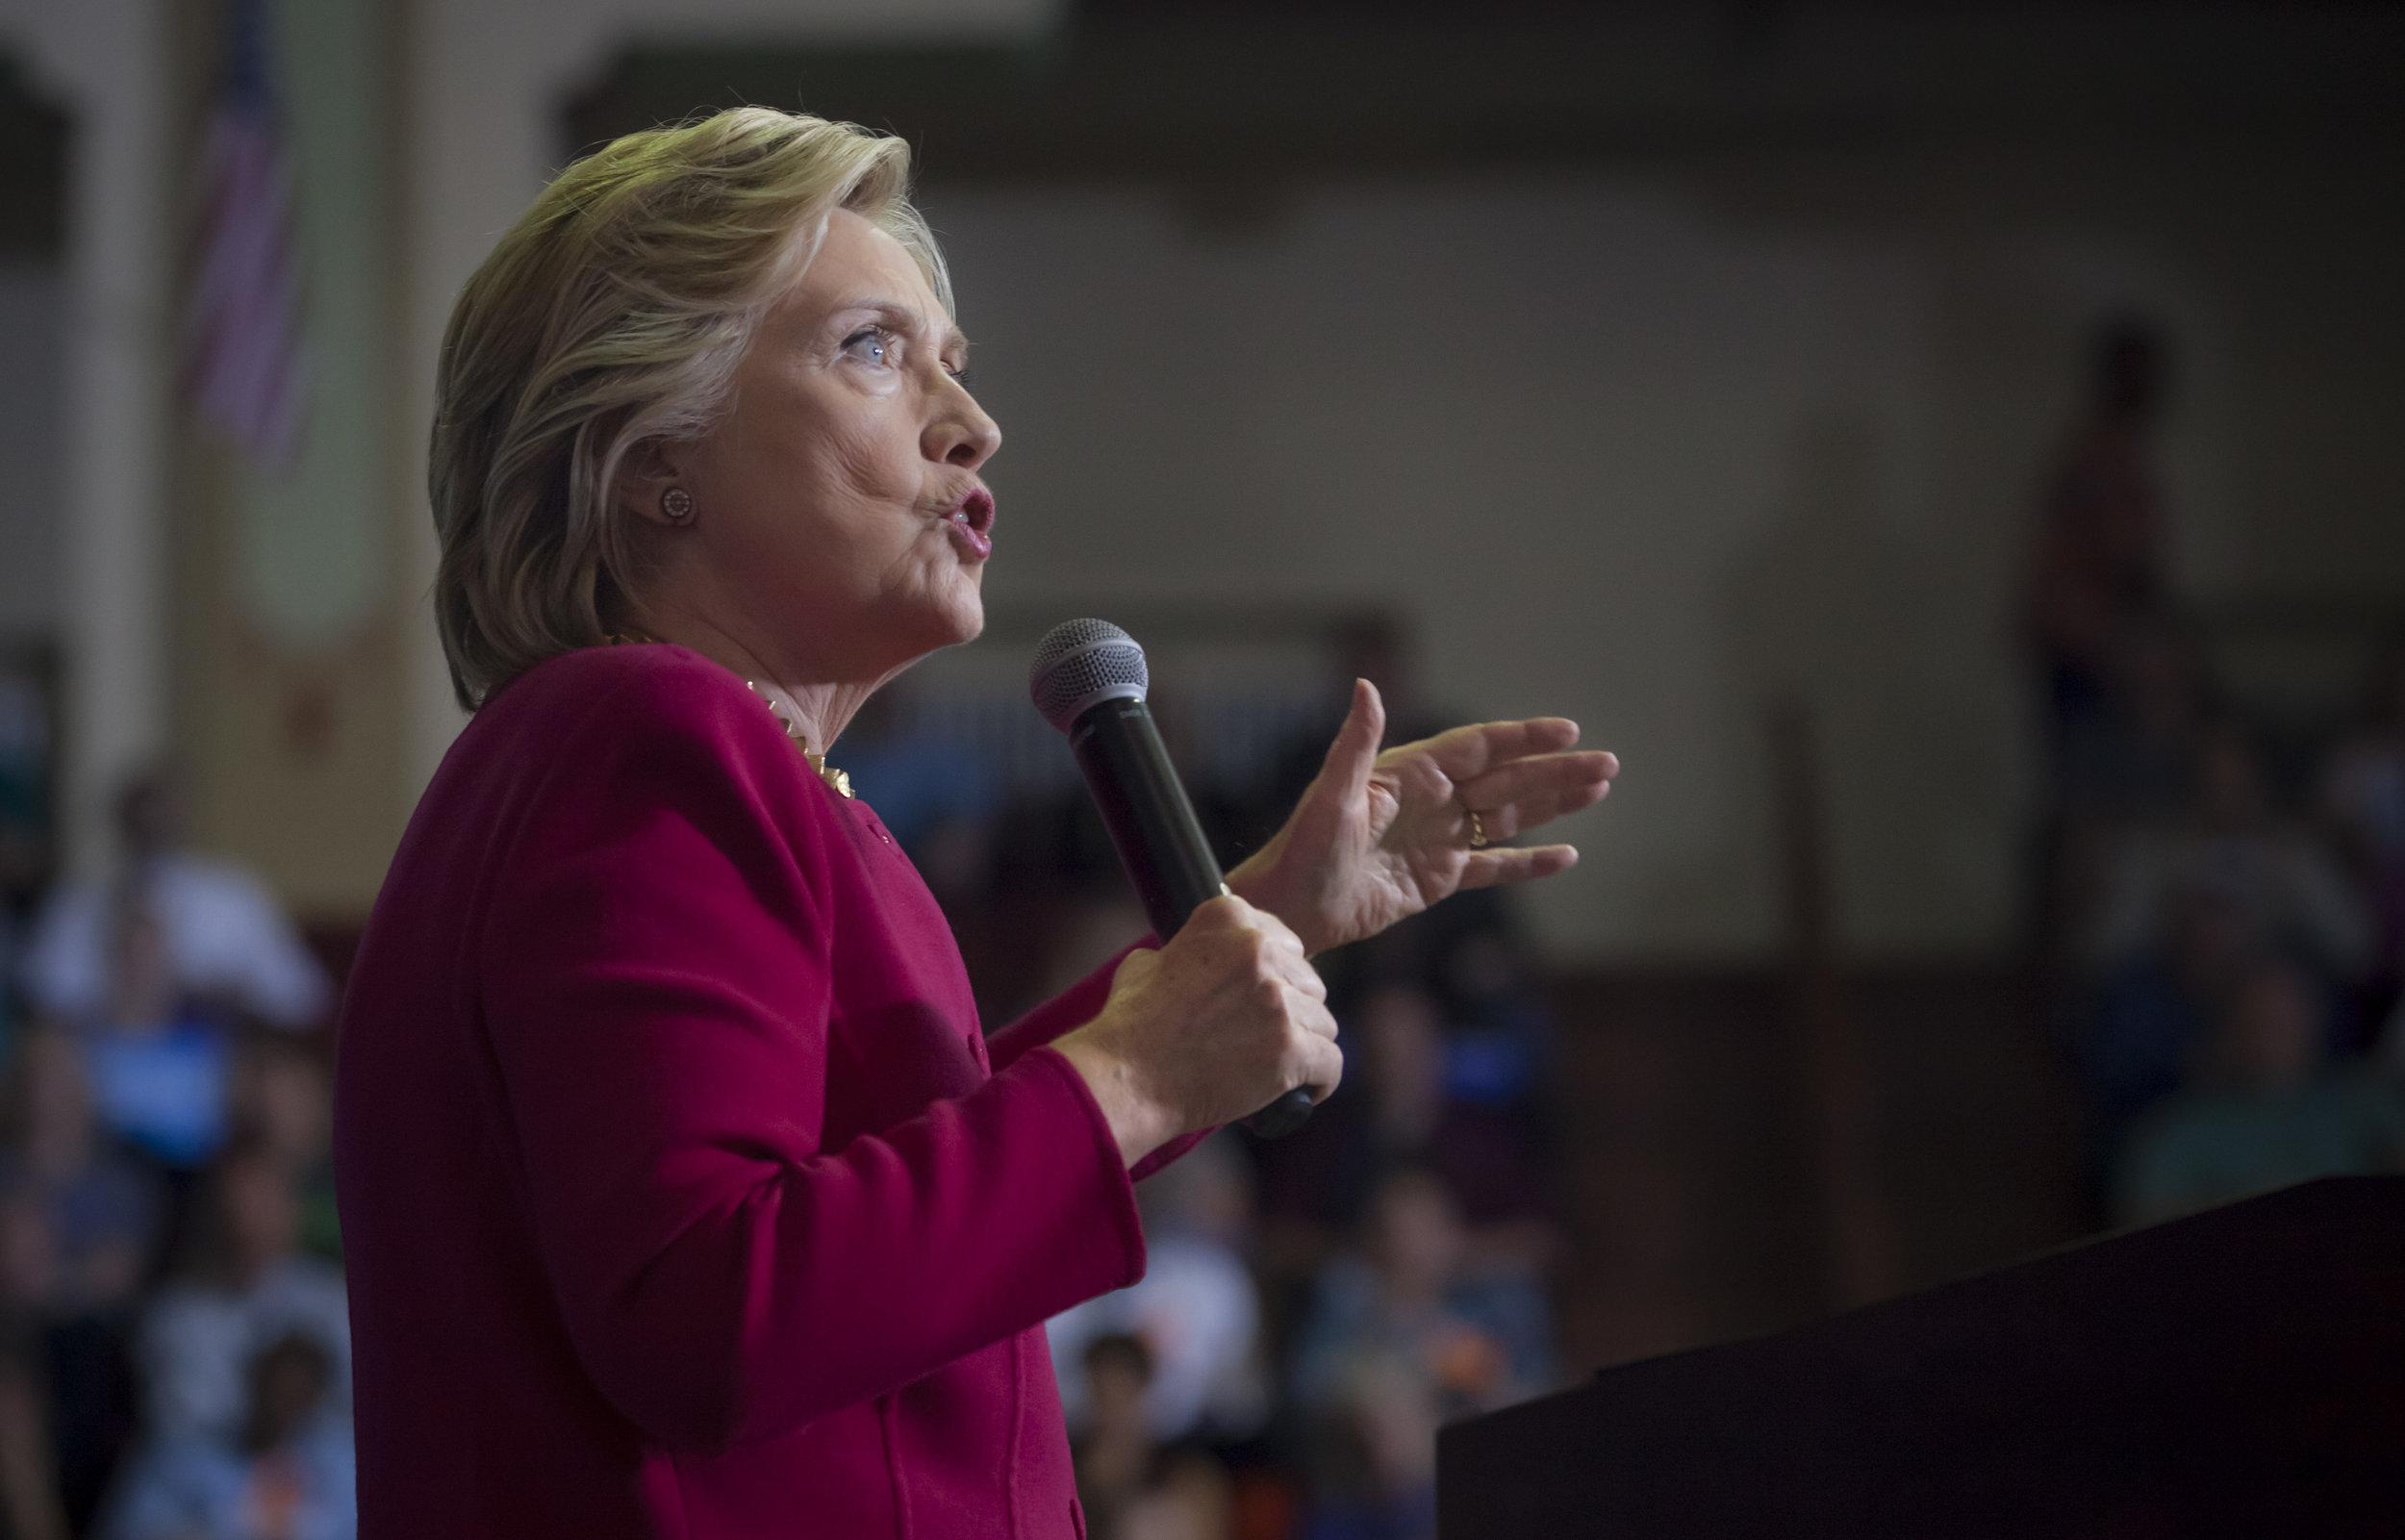 10042016_BJM_Hillary_Clinton_Campaigns_in_Harrisburg_Pennsylvania_03.jpg